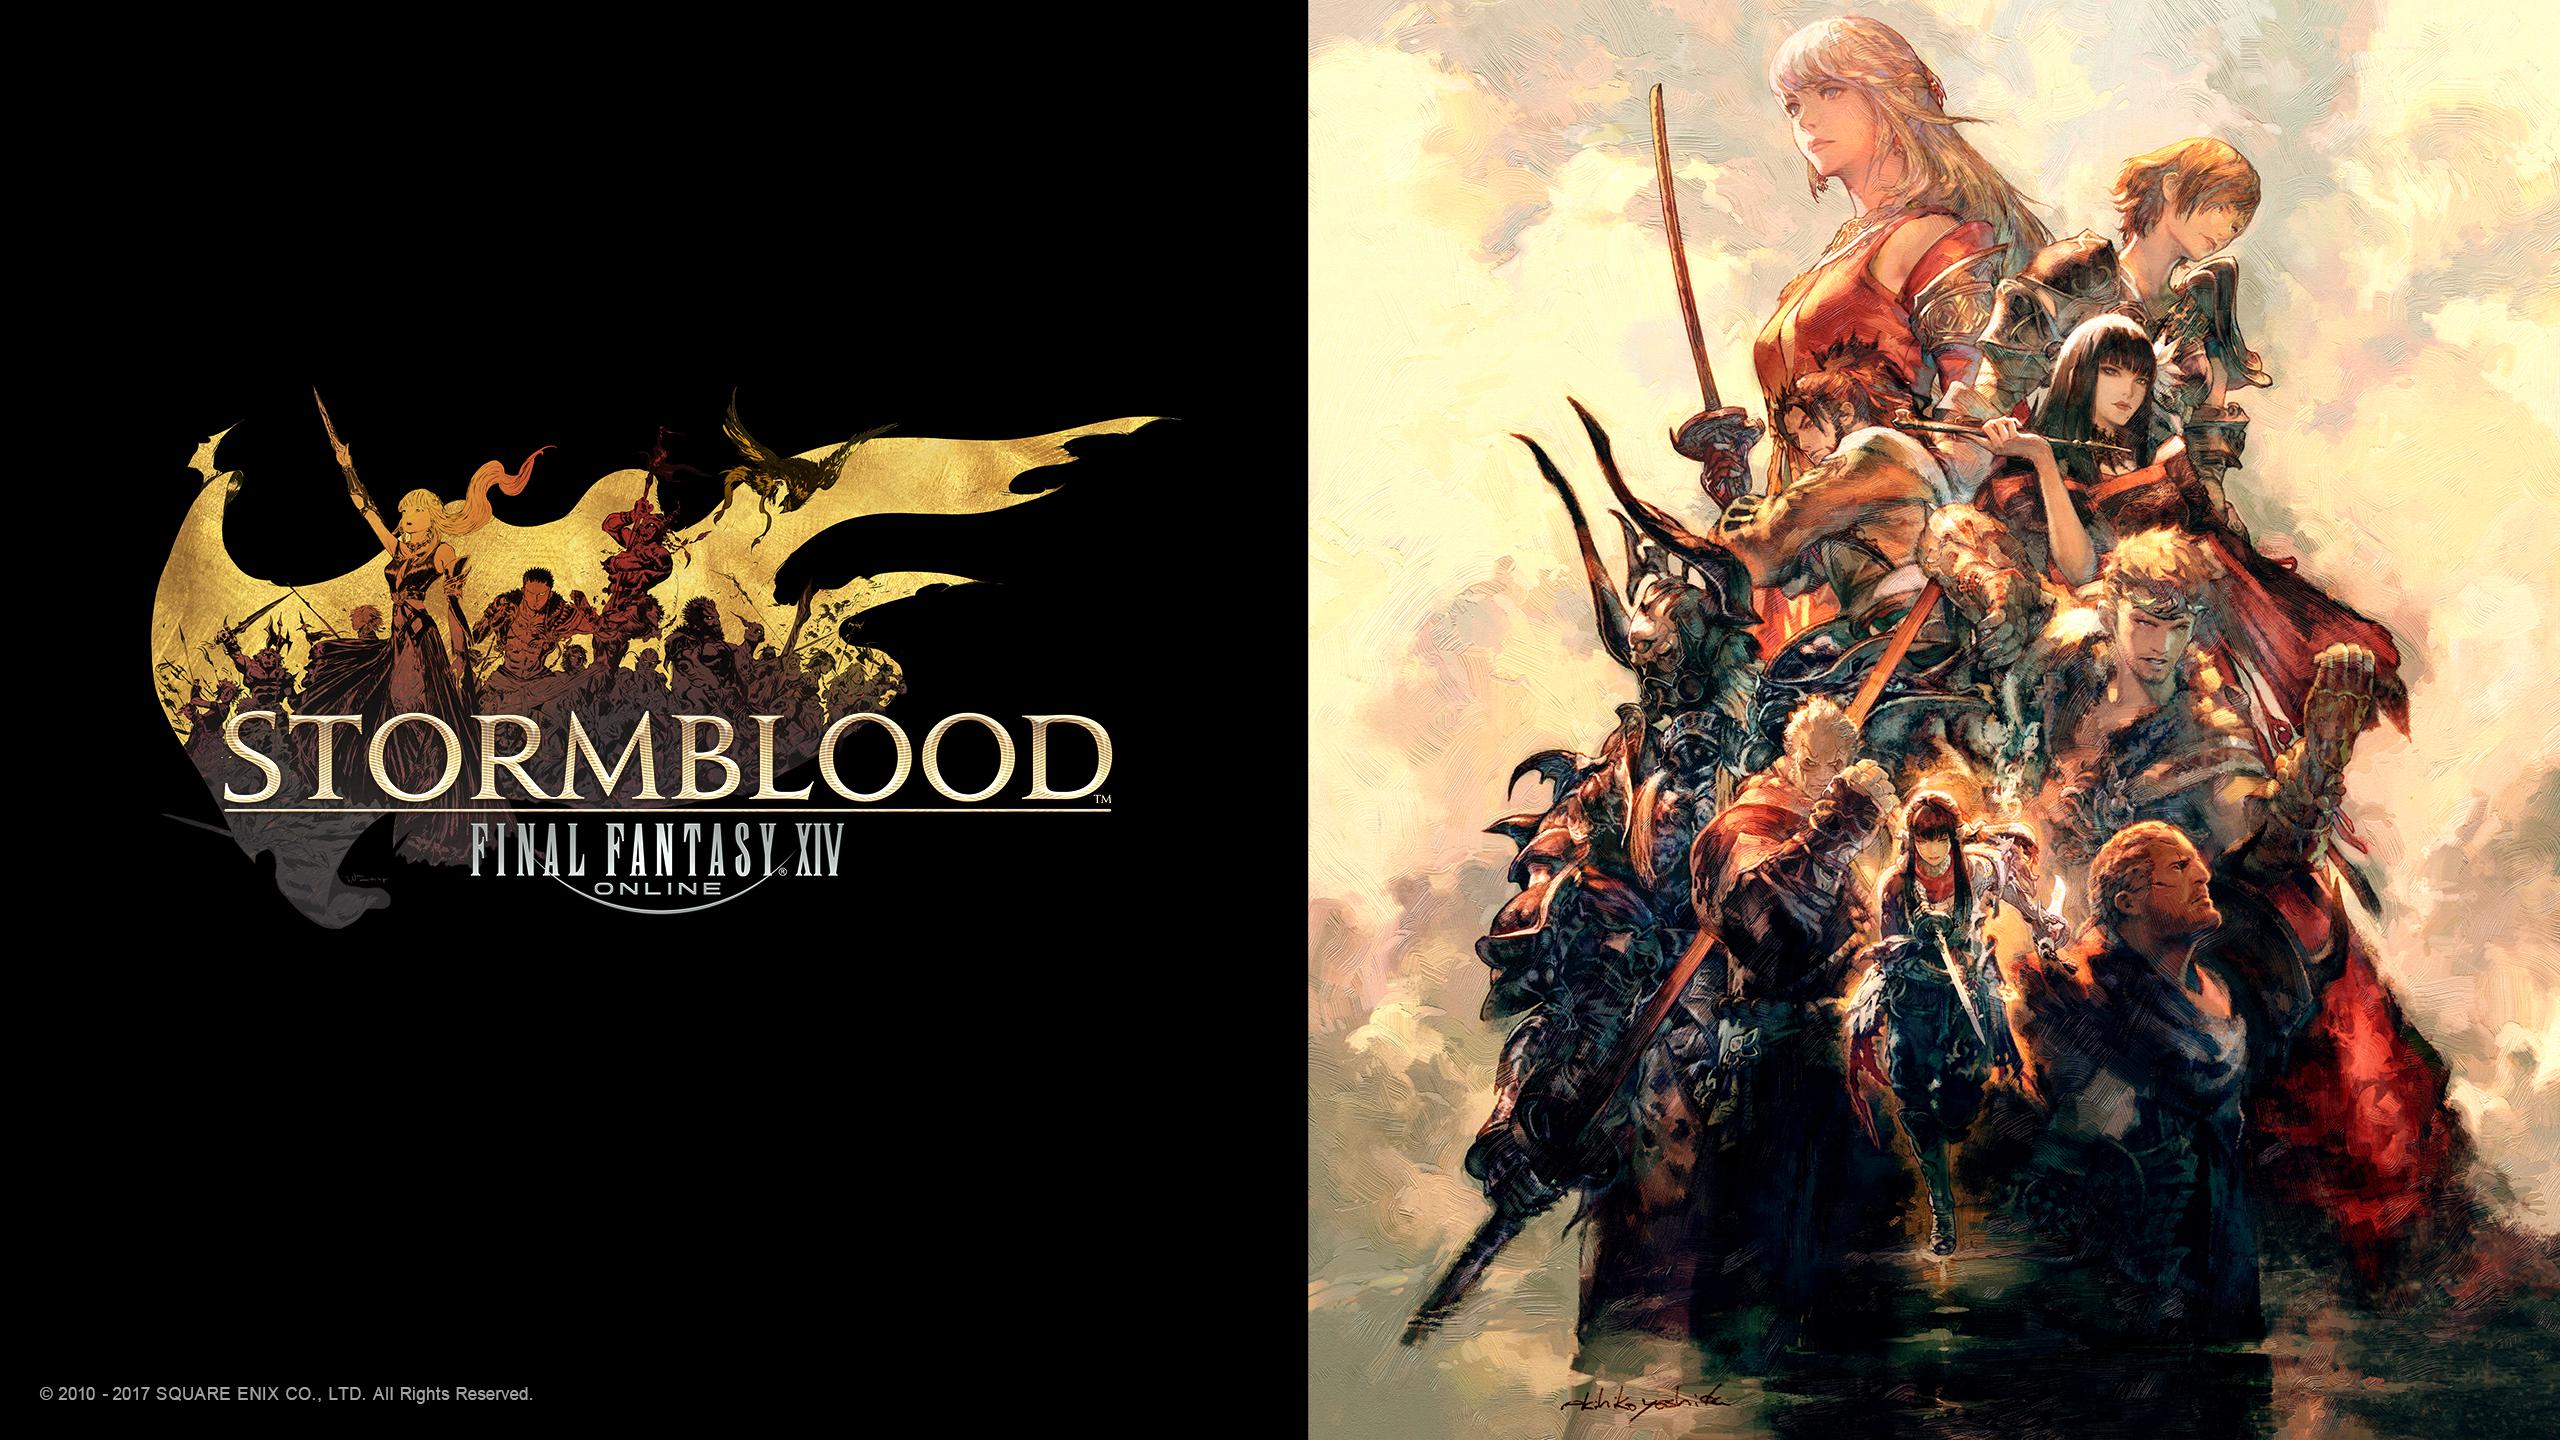 Final Fantasy Xiv Stormblood - HD Wallpaper